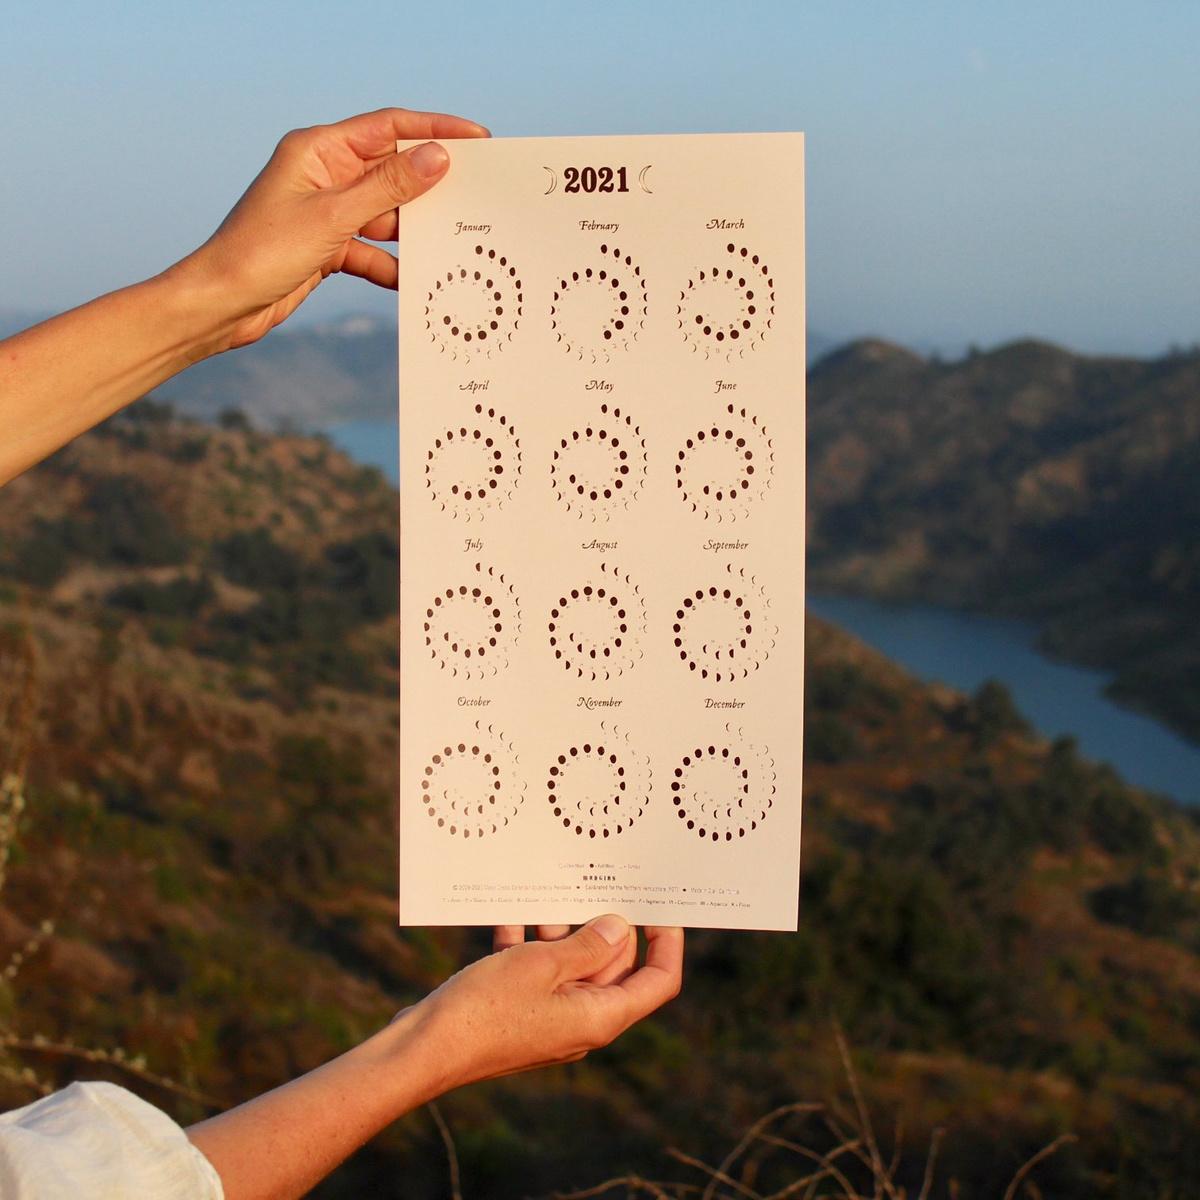 Margins Imprint 2021 Rose Gold on Blush Moon Phase Calendar - Framed